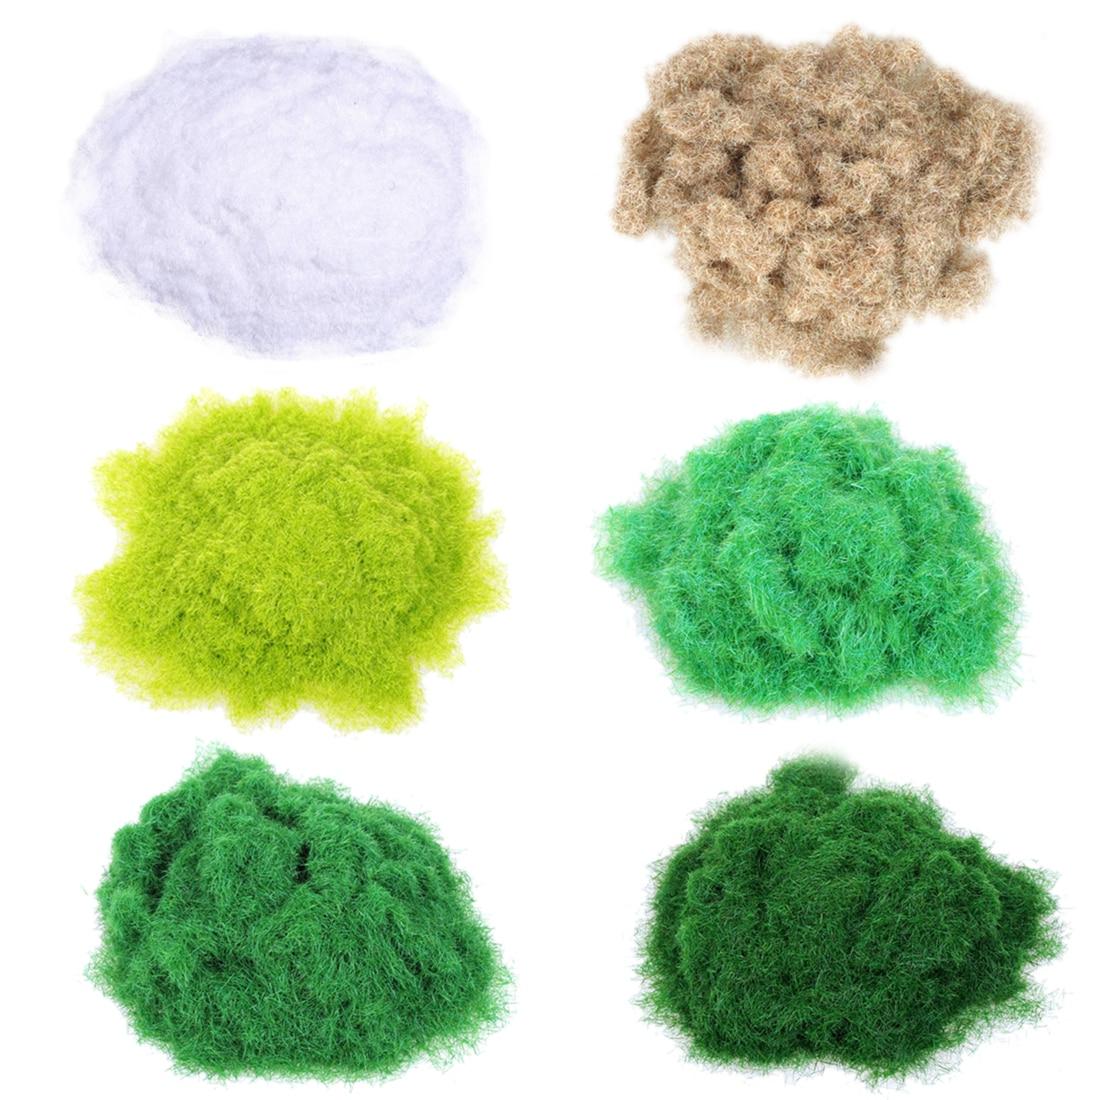 4/6PCS Colors 30g Artificial Grass Powder DIY Railway Model Sand Table Model Building Kit Decor - Grass Yellow